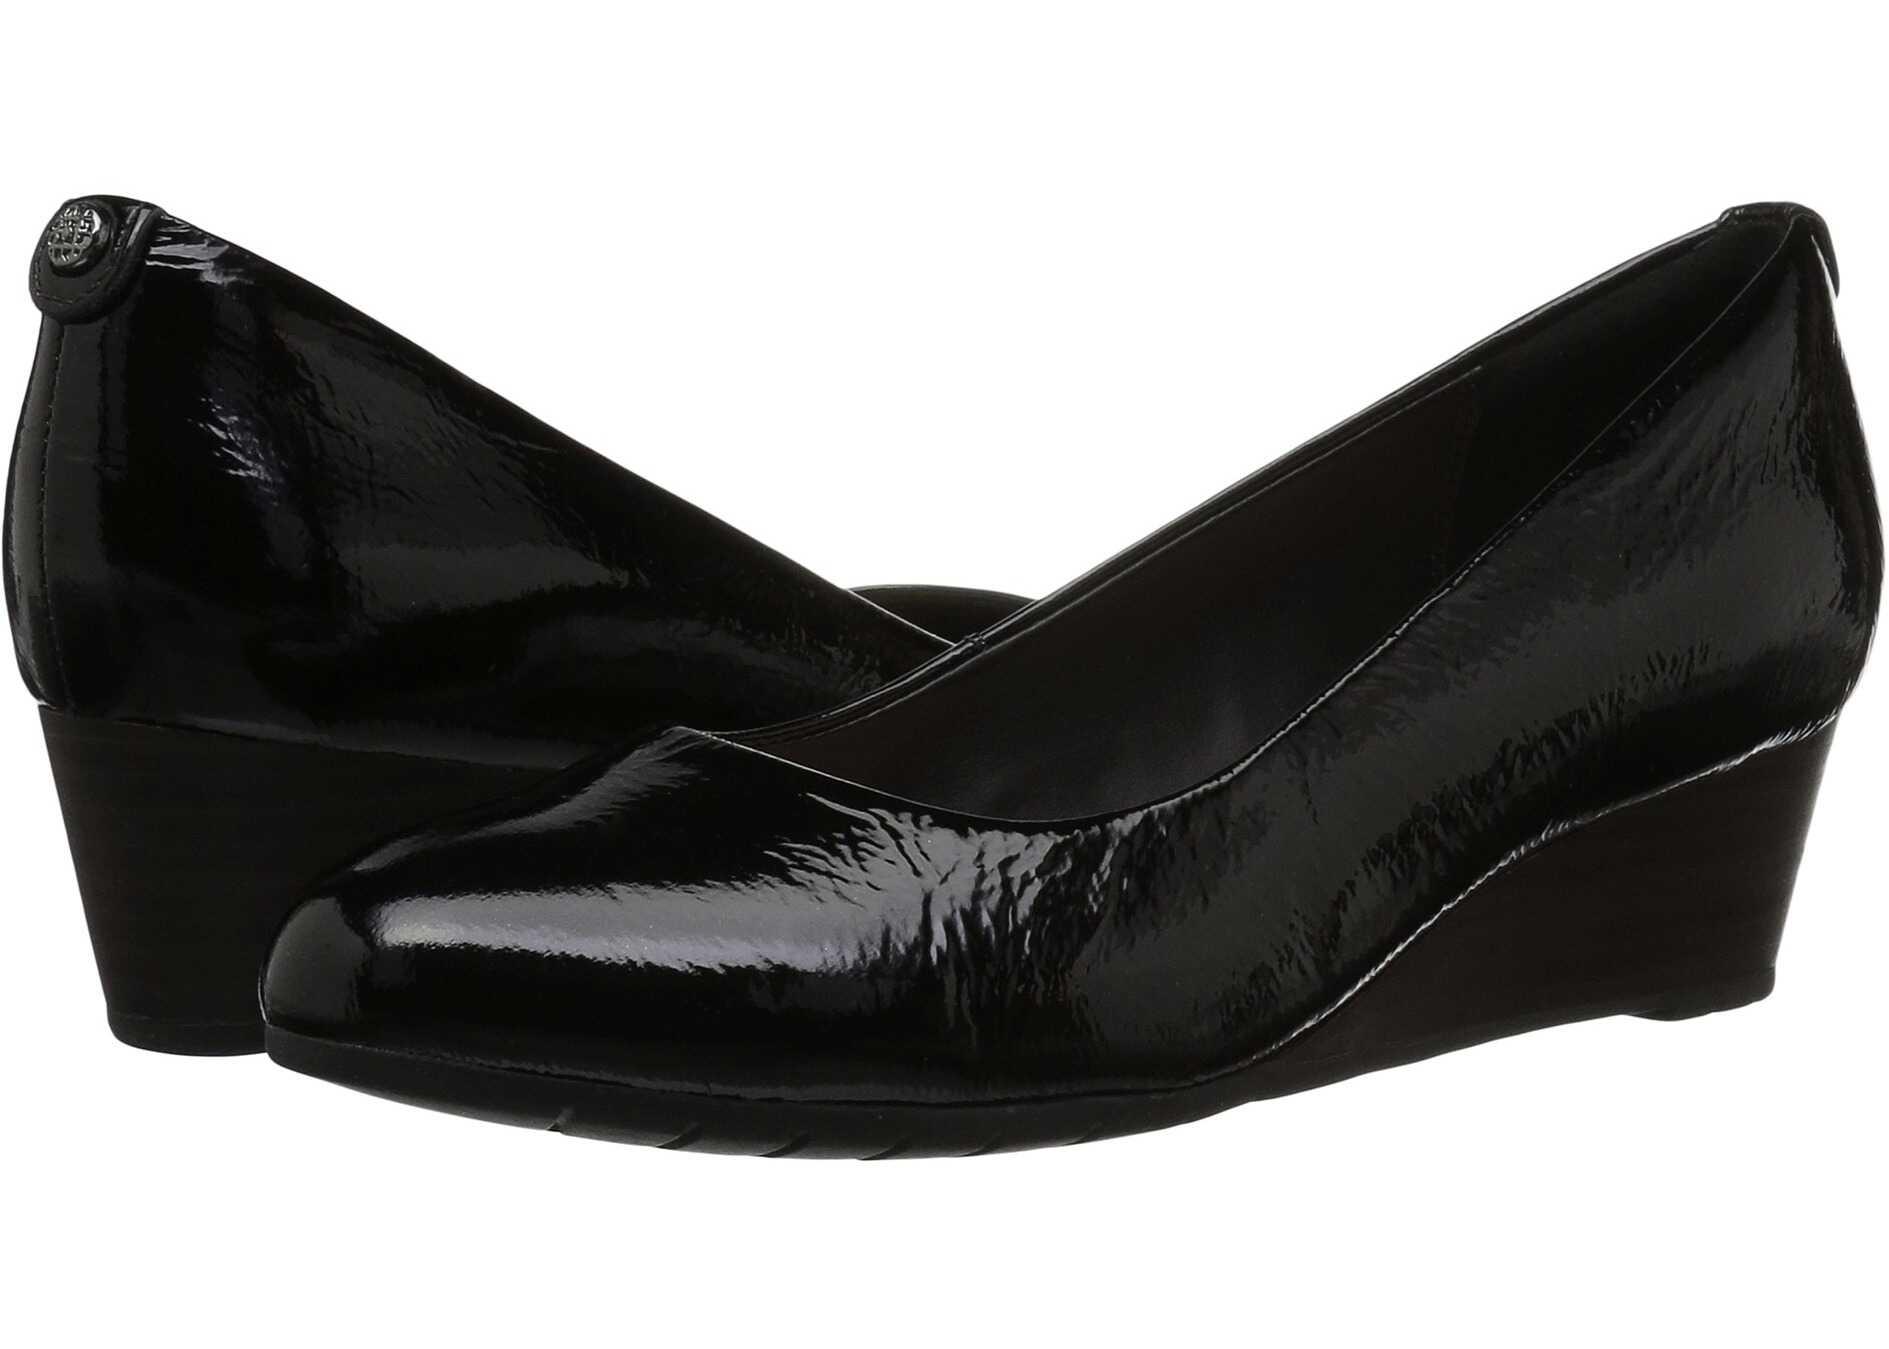 Clarks Vendra Bloom Black Patent Leather